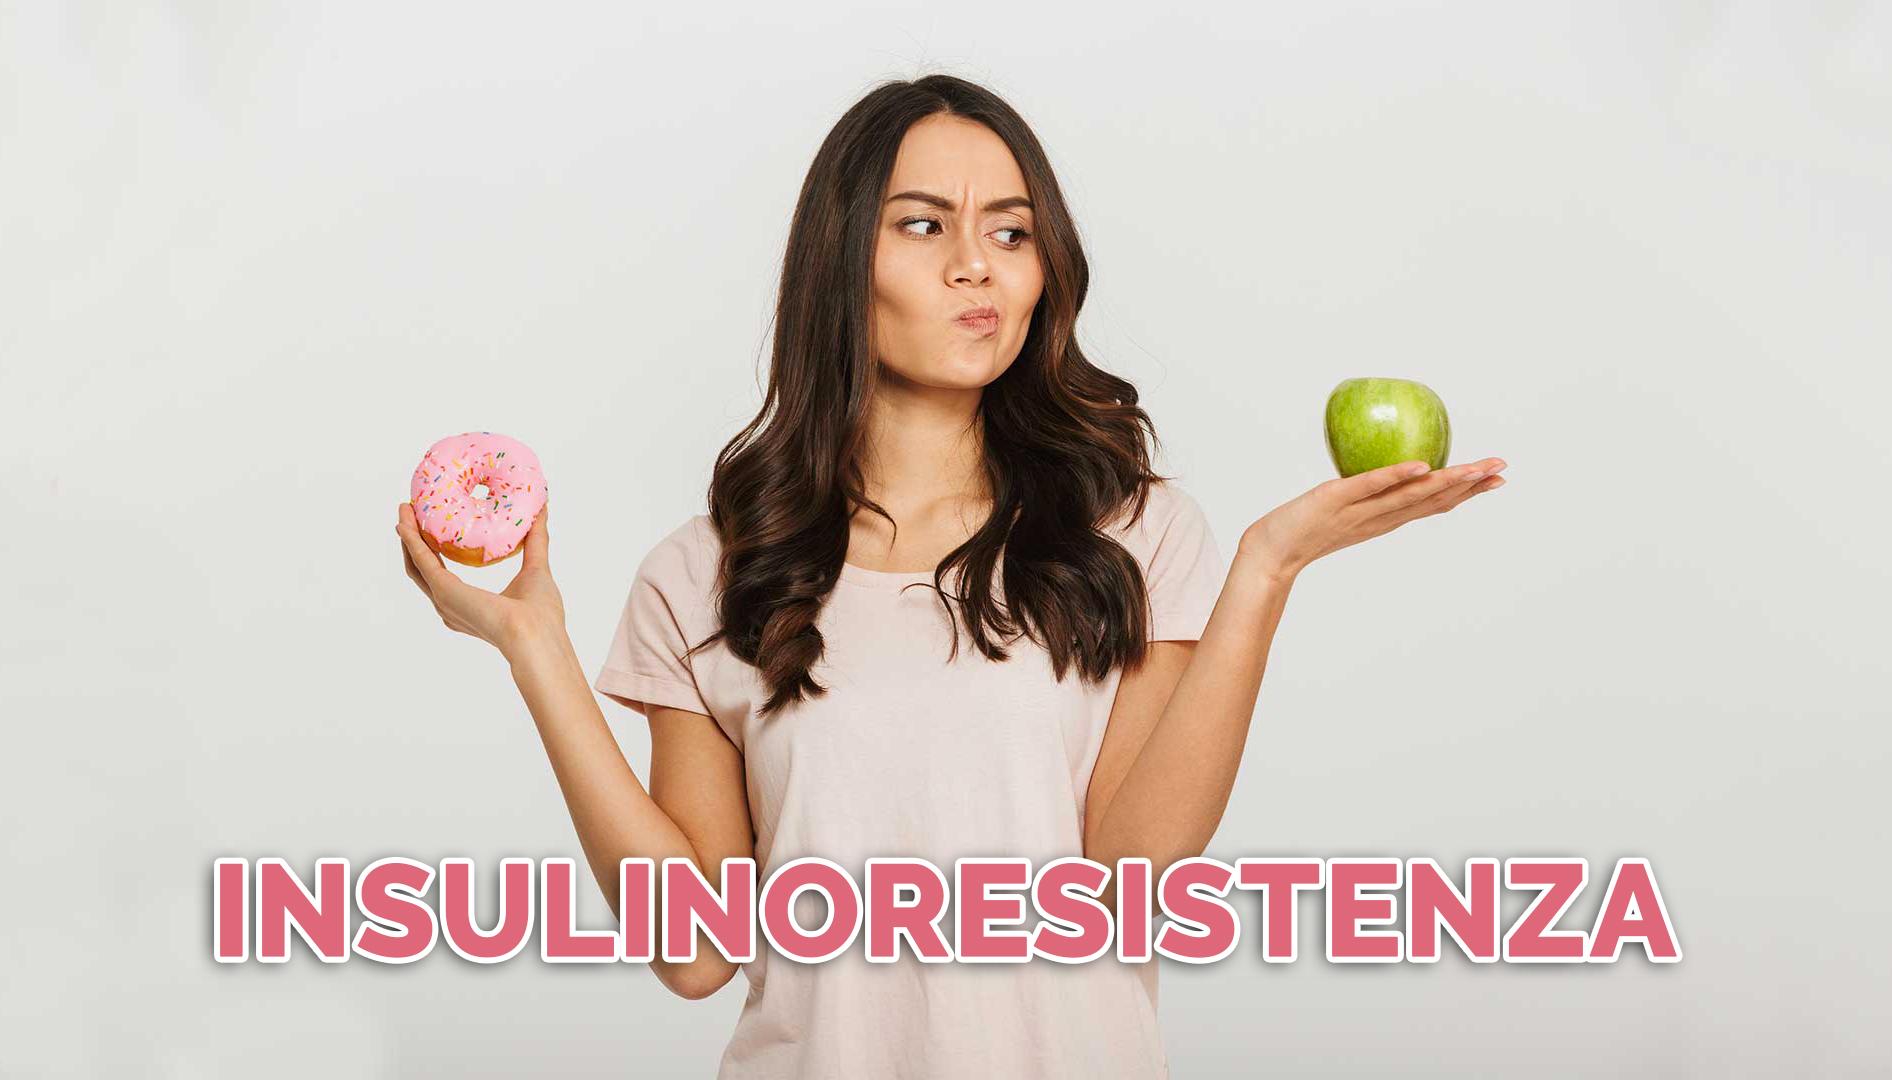 dieta-insulinoresistenza